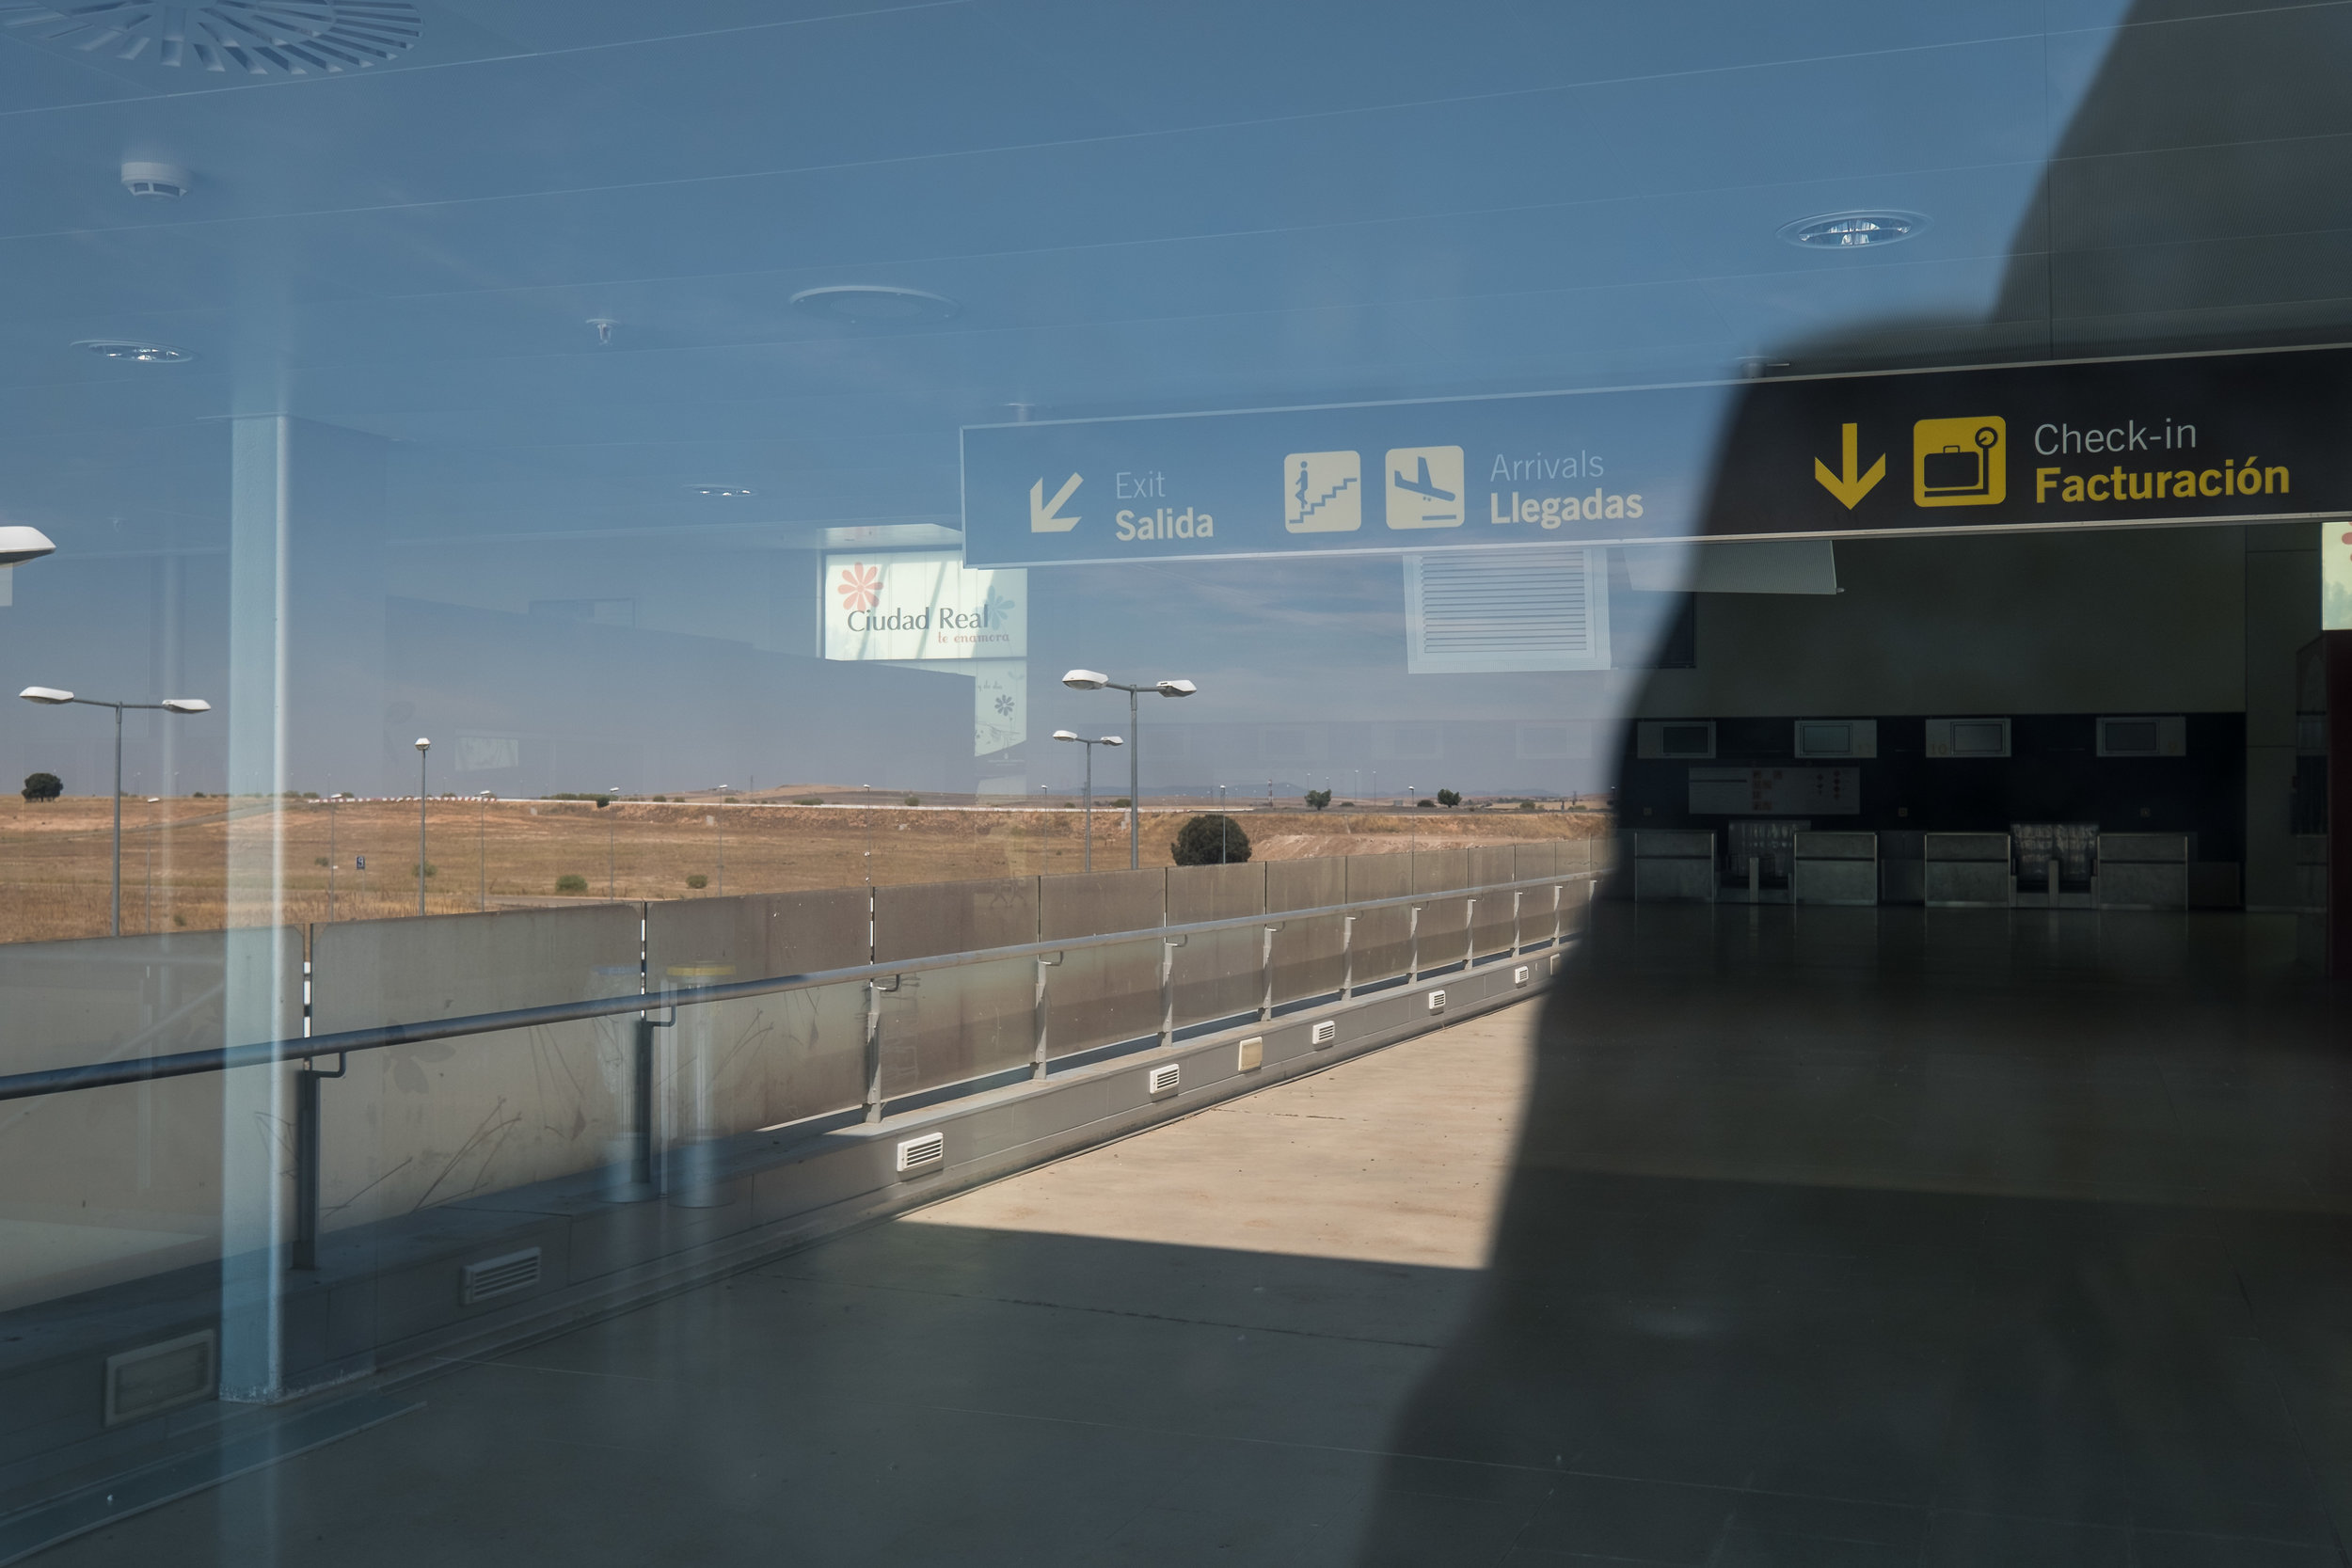 Ciudad Real airport-7.jpg